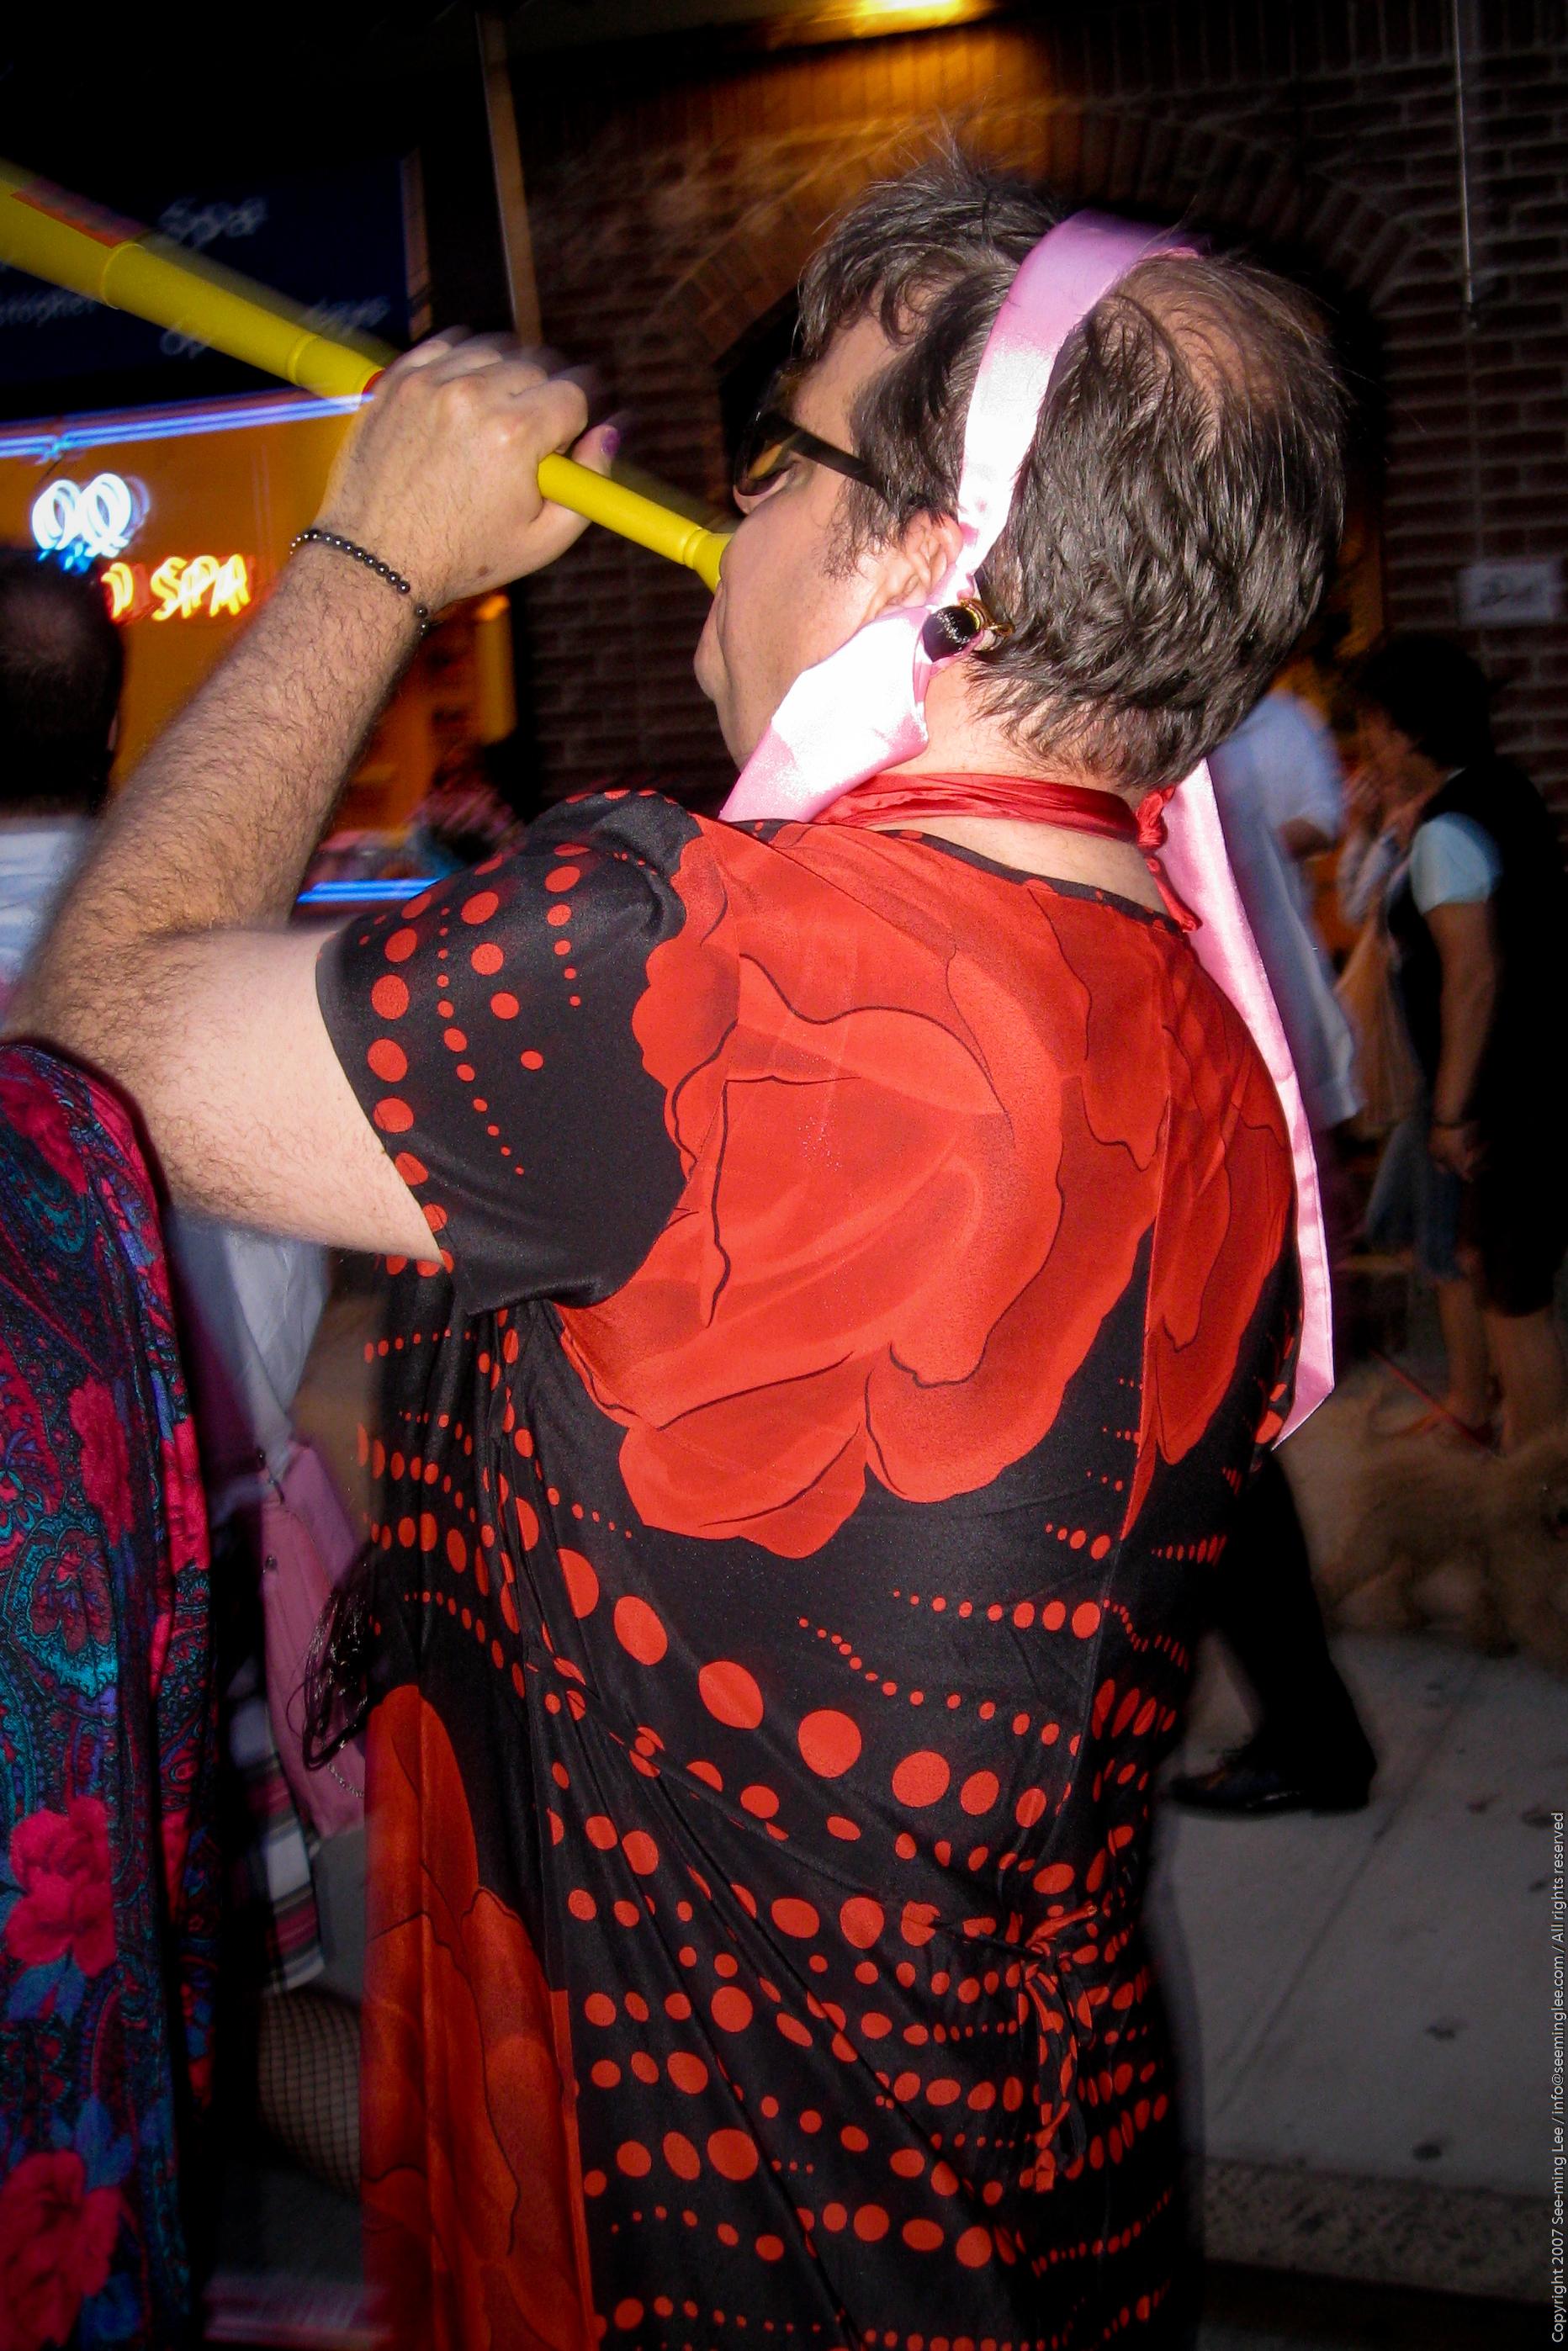 creativity happiness men makeup wig costume diversity red highlights highlight bestof gay gay pride new york 2007 pride 07 colorful Radical Faeries portrait